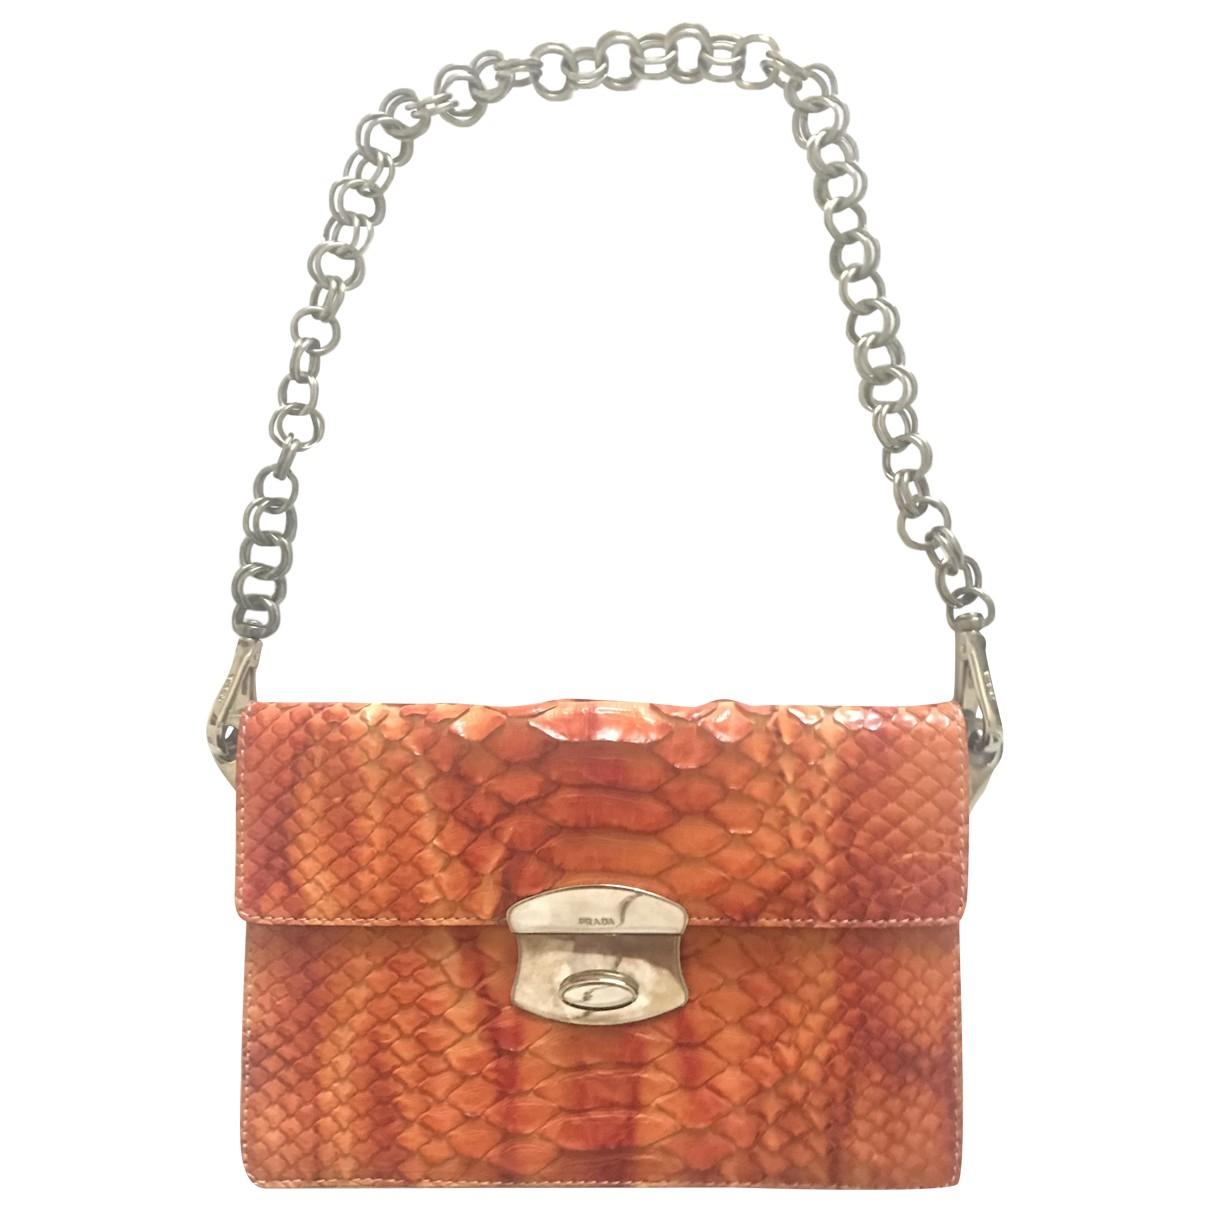 Prada \N Orange Lizard handbag for Women \N